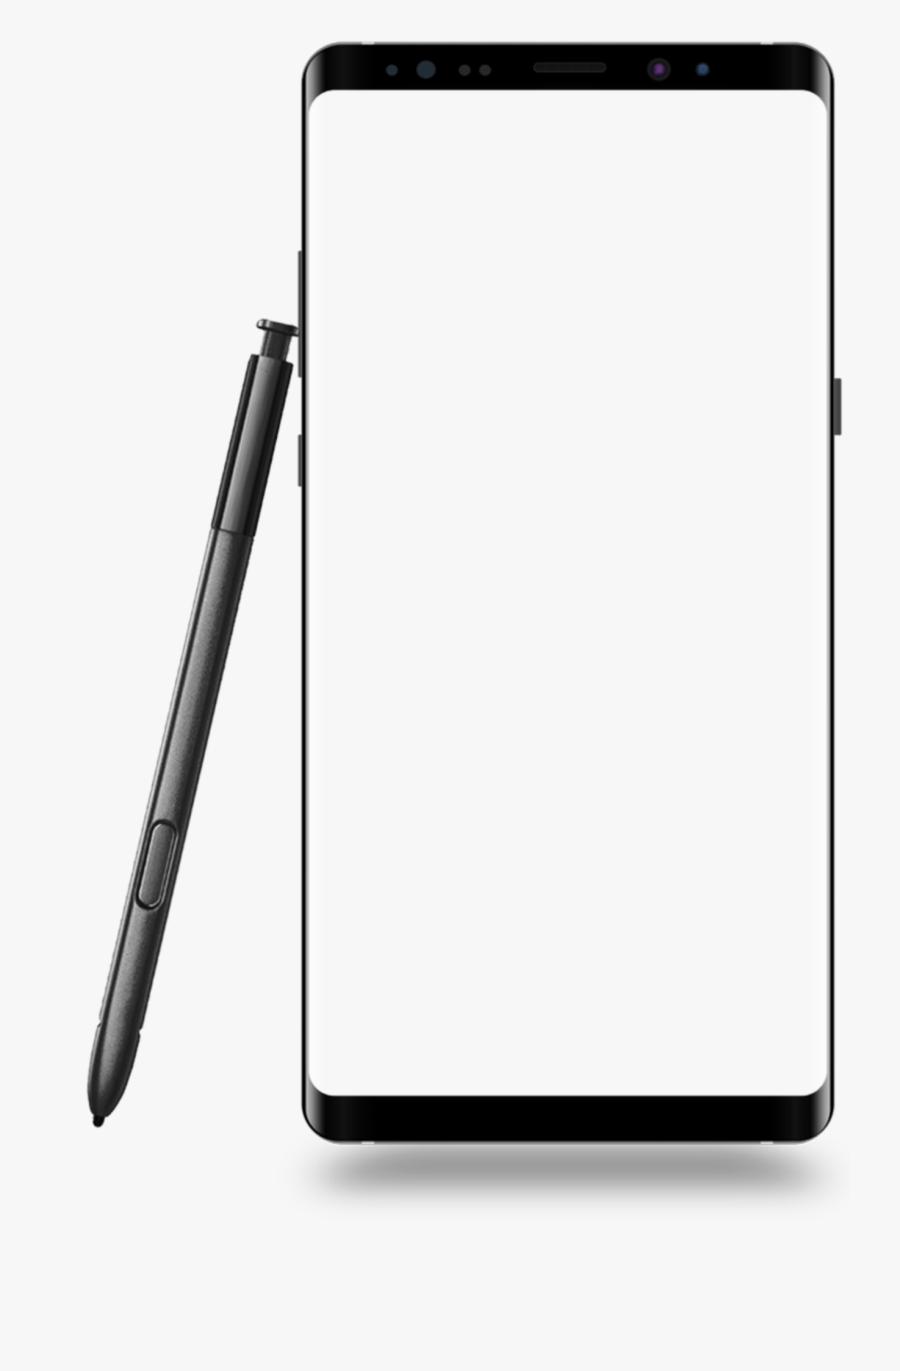 Transparent Galaxy Clipart Png - Mobile Phone, Transparent Clipart